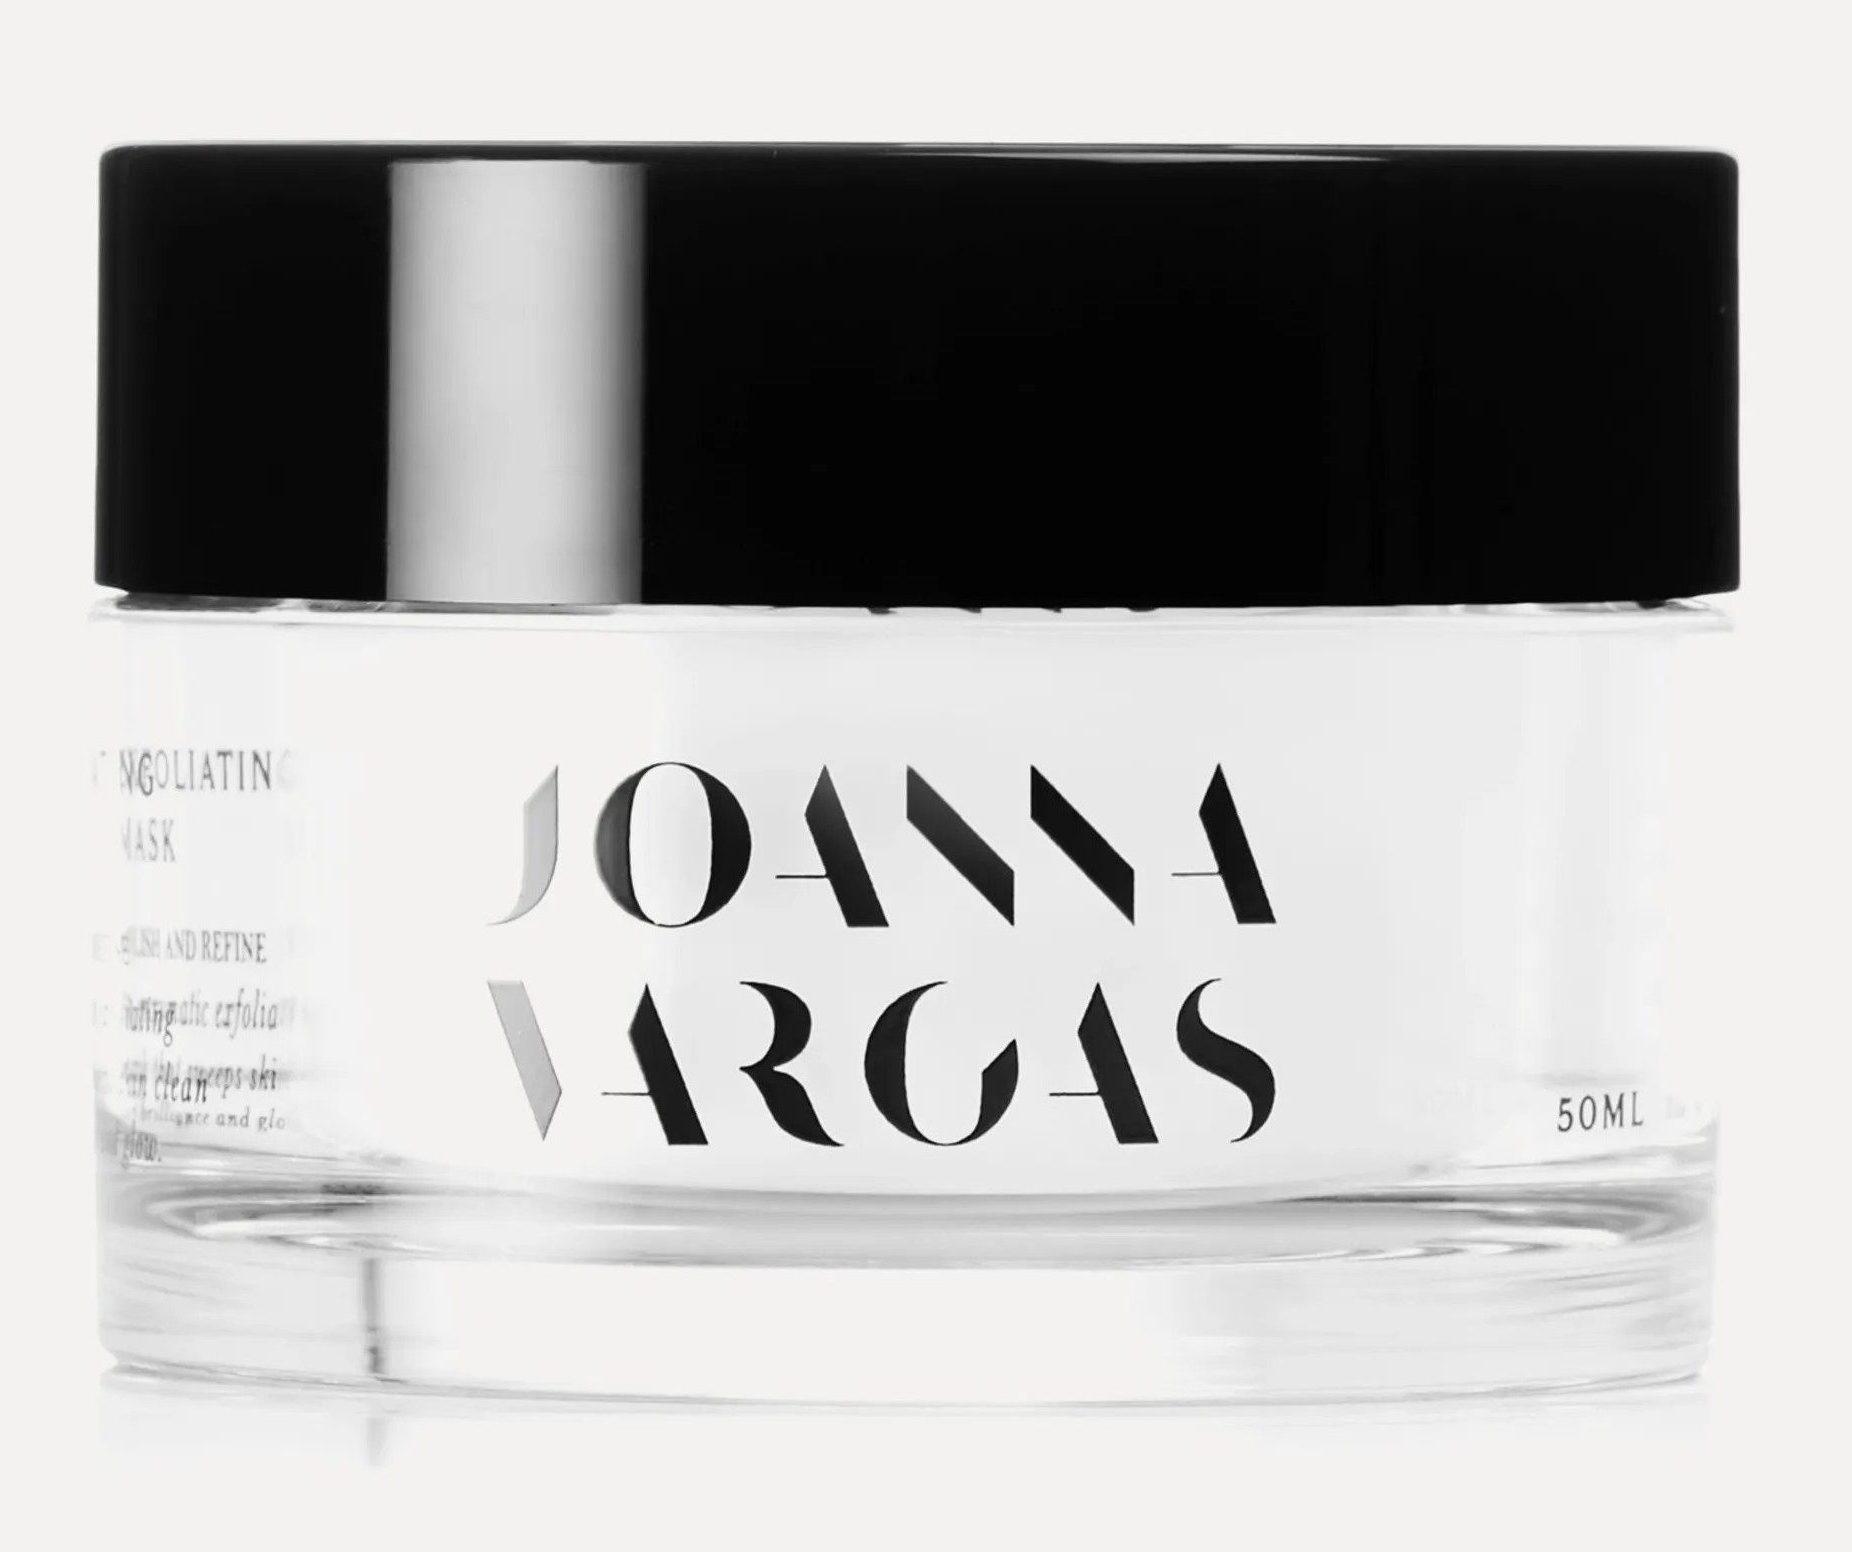 Joanna Vargas Exfoliating Face Mask Amazon Prime Day 2020